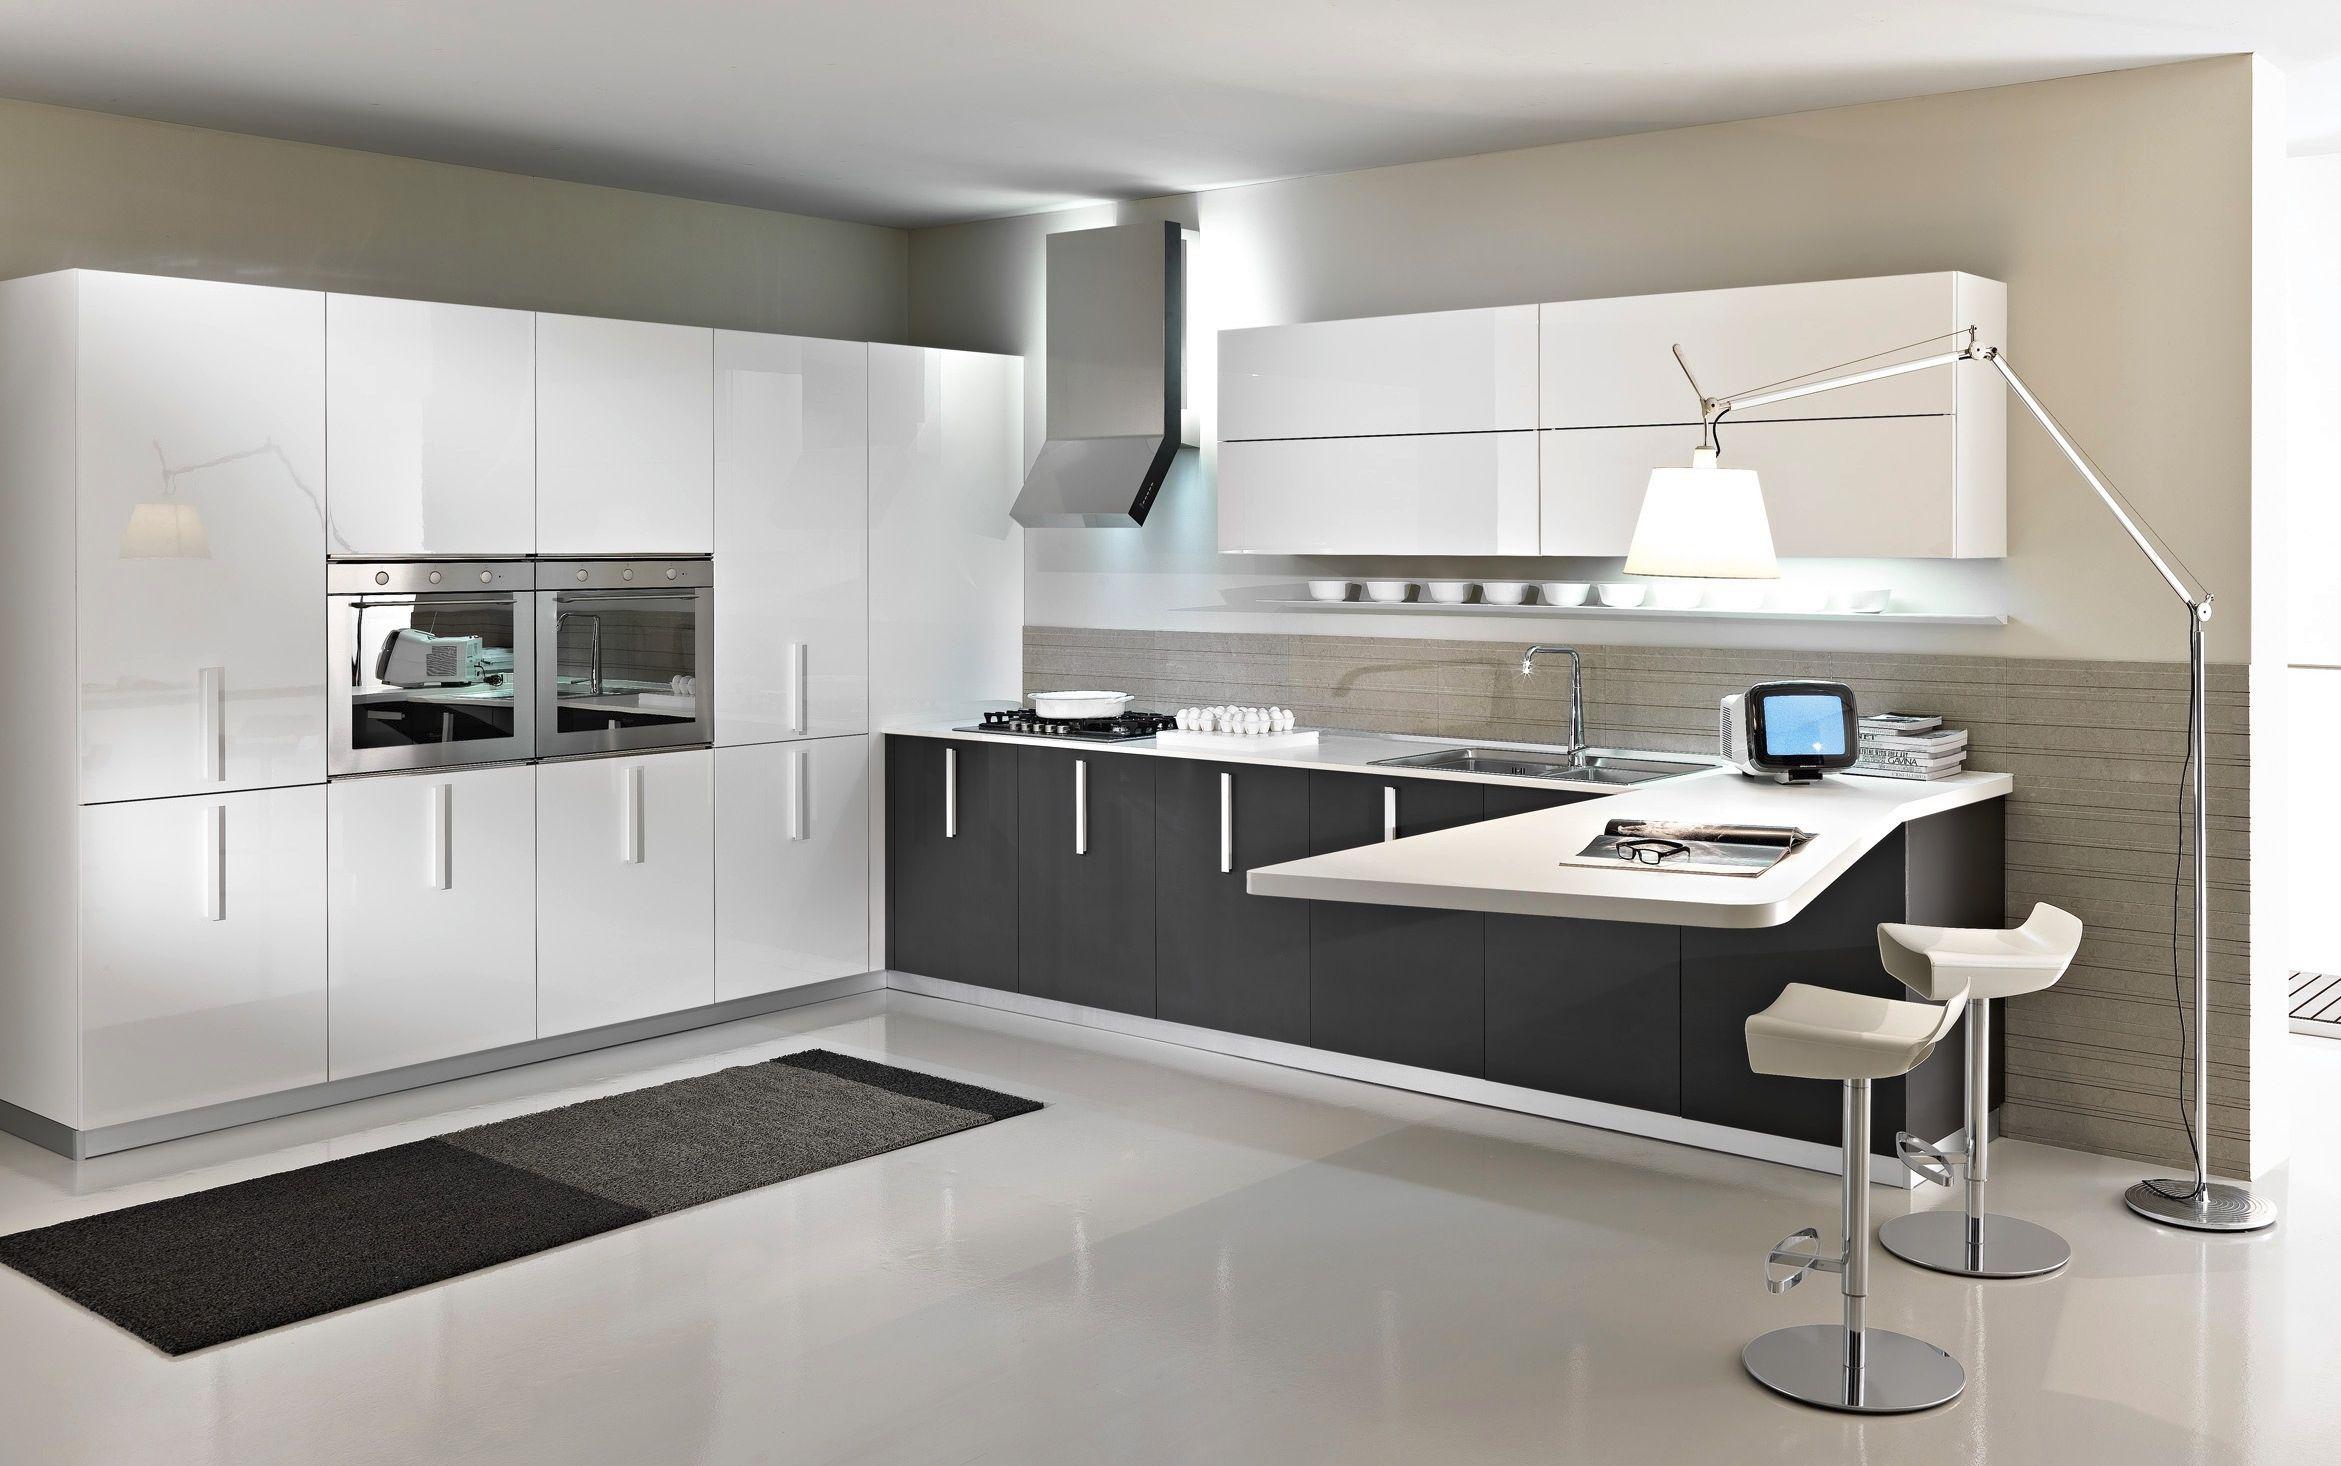 Cucine Moderne Prezzi - Notizie.it